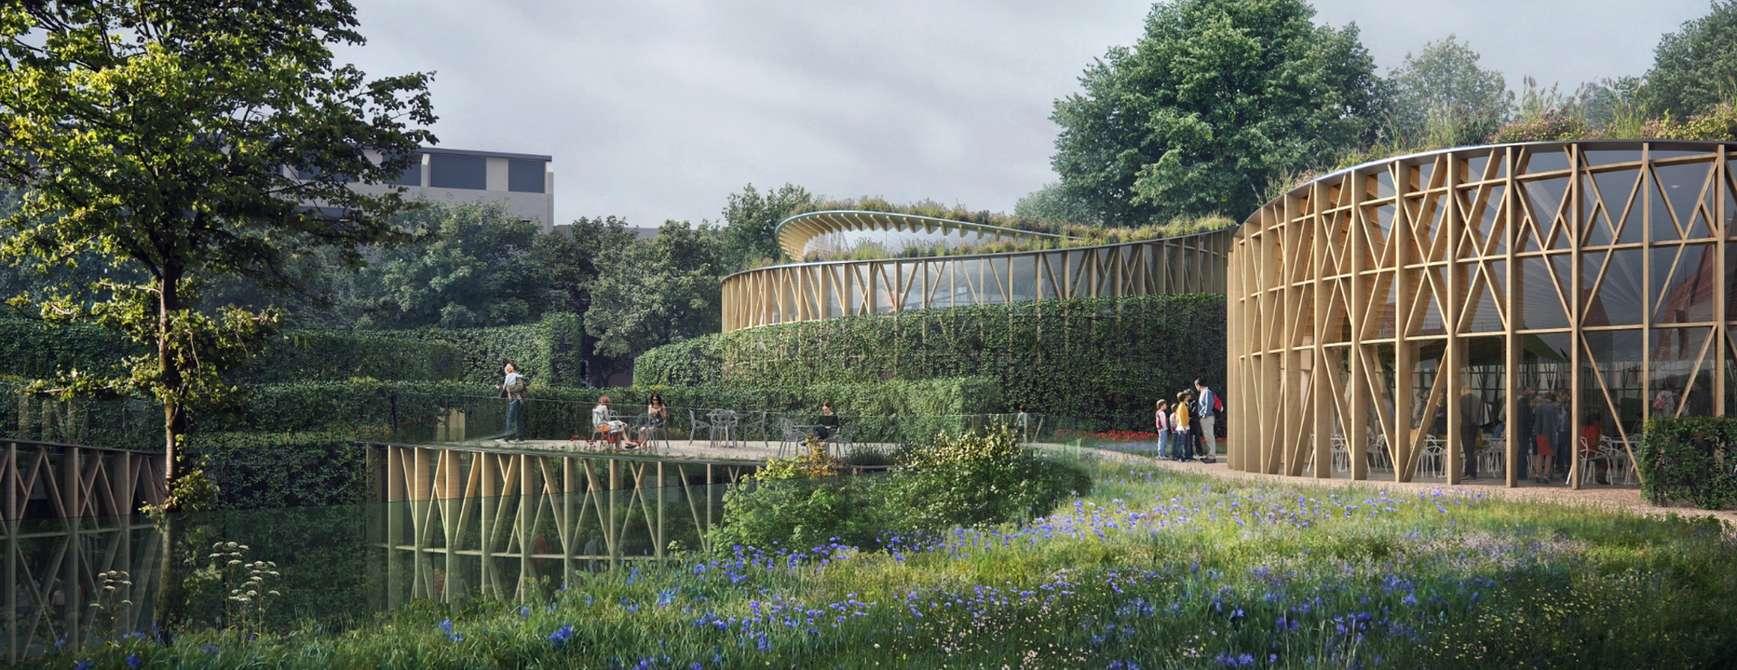 H.C. Andersens Hus i Odense. @Kengo Kuma & Associates, Cornelius Vöge og MASU Planning